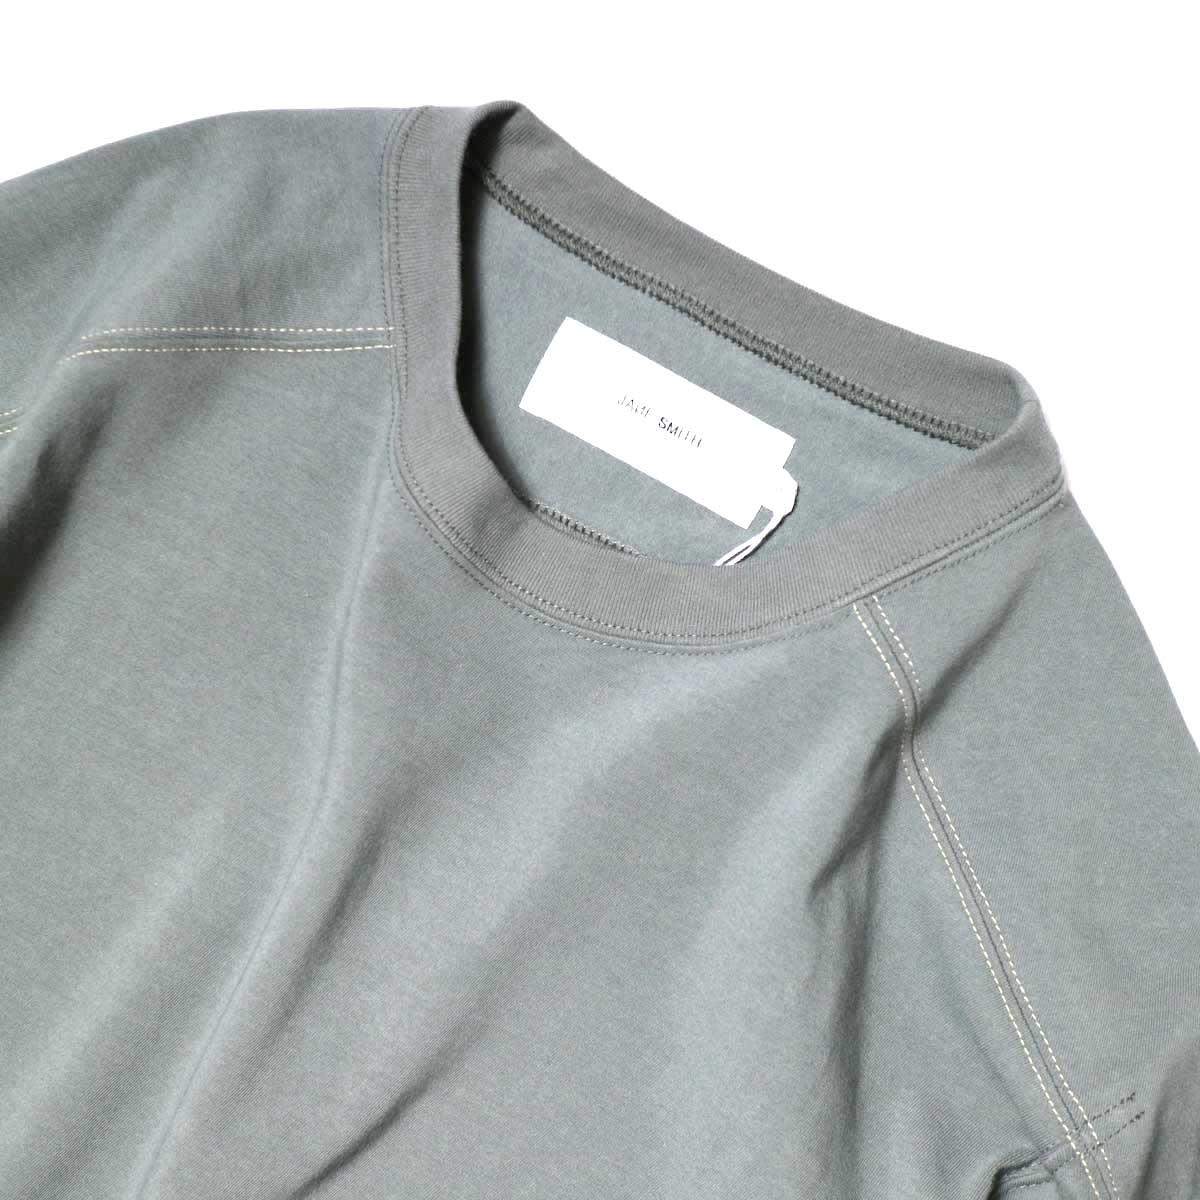 JANE SMITH / CLASSIC FOOTBALL T-SHIRT (Sage Green) 襟